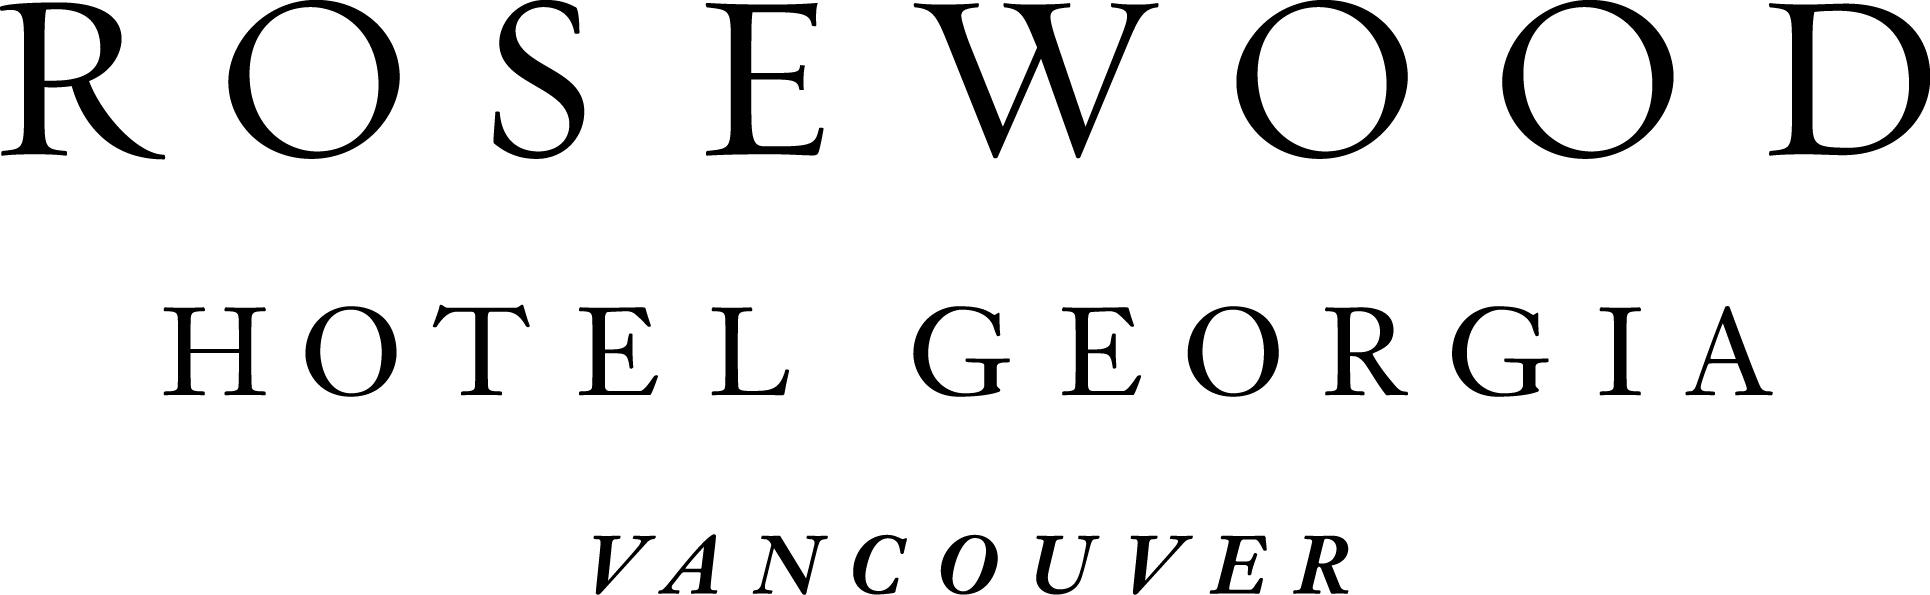 Rosewood Hotel Georgia Room Service Menu